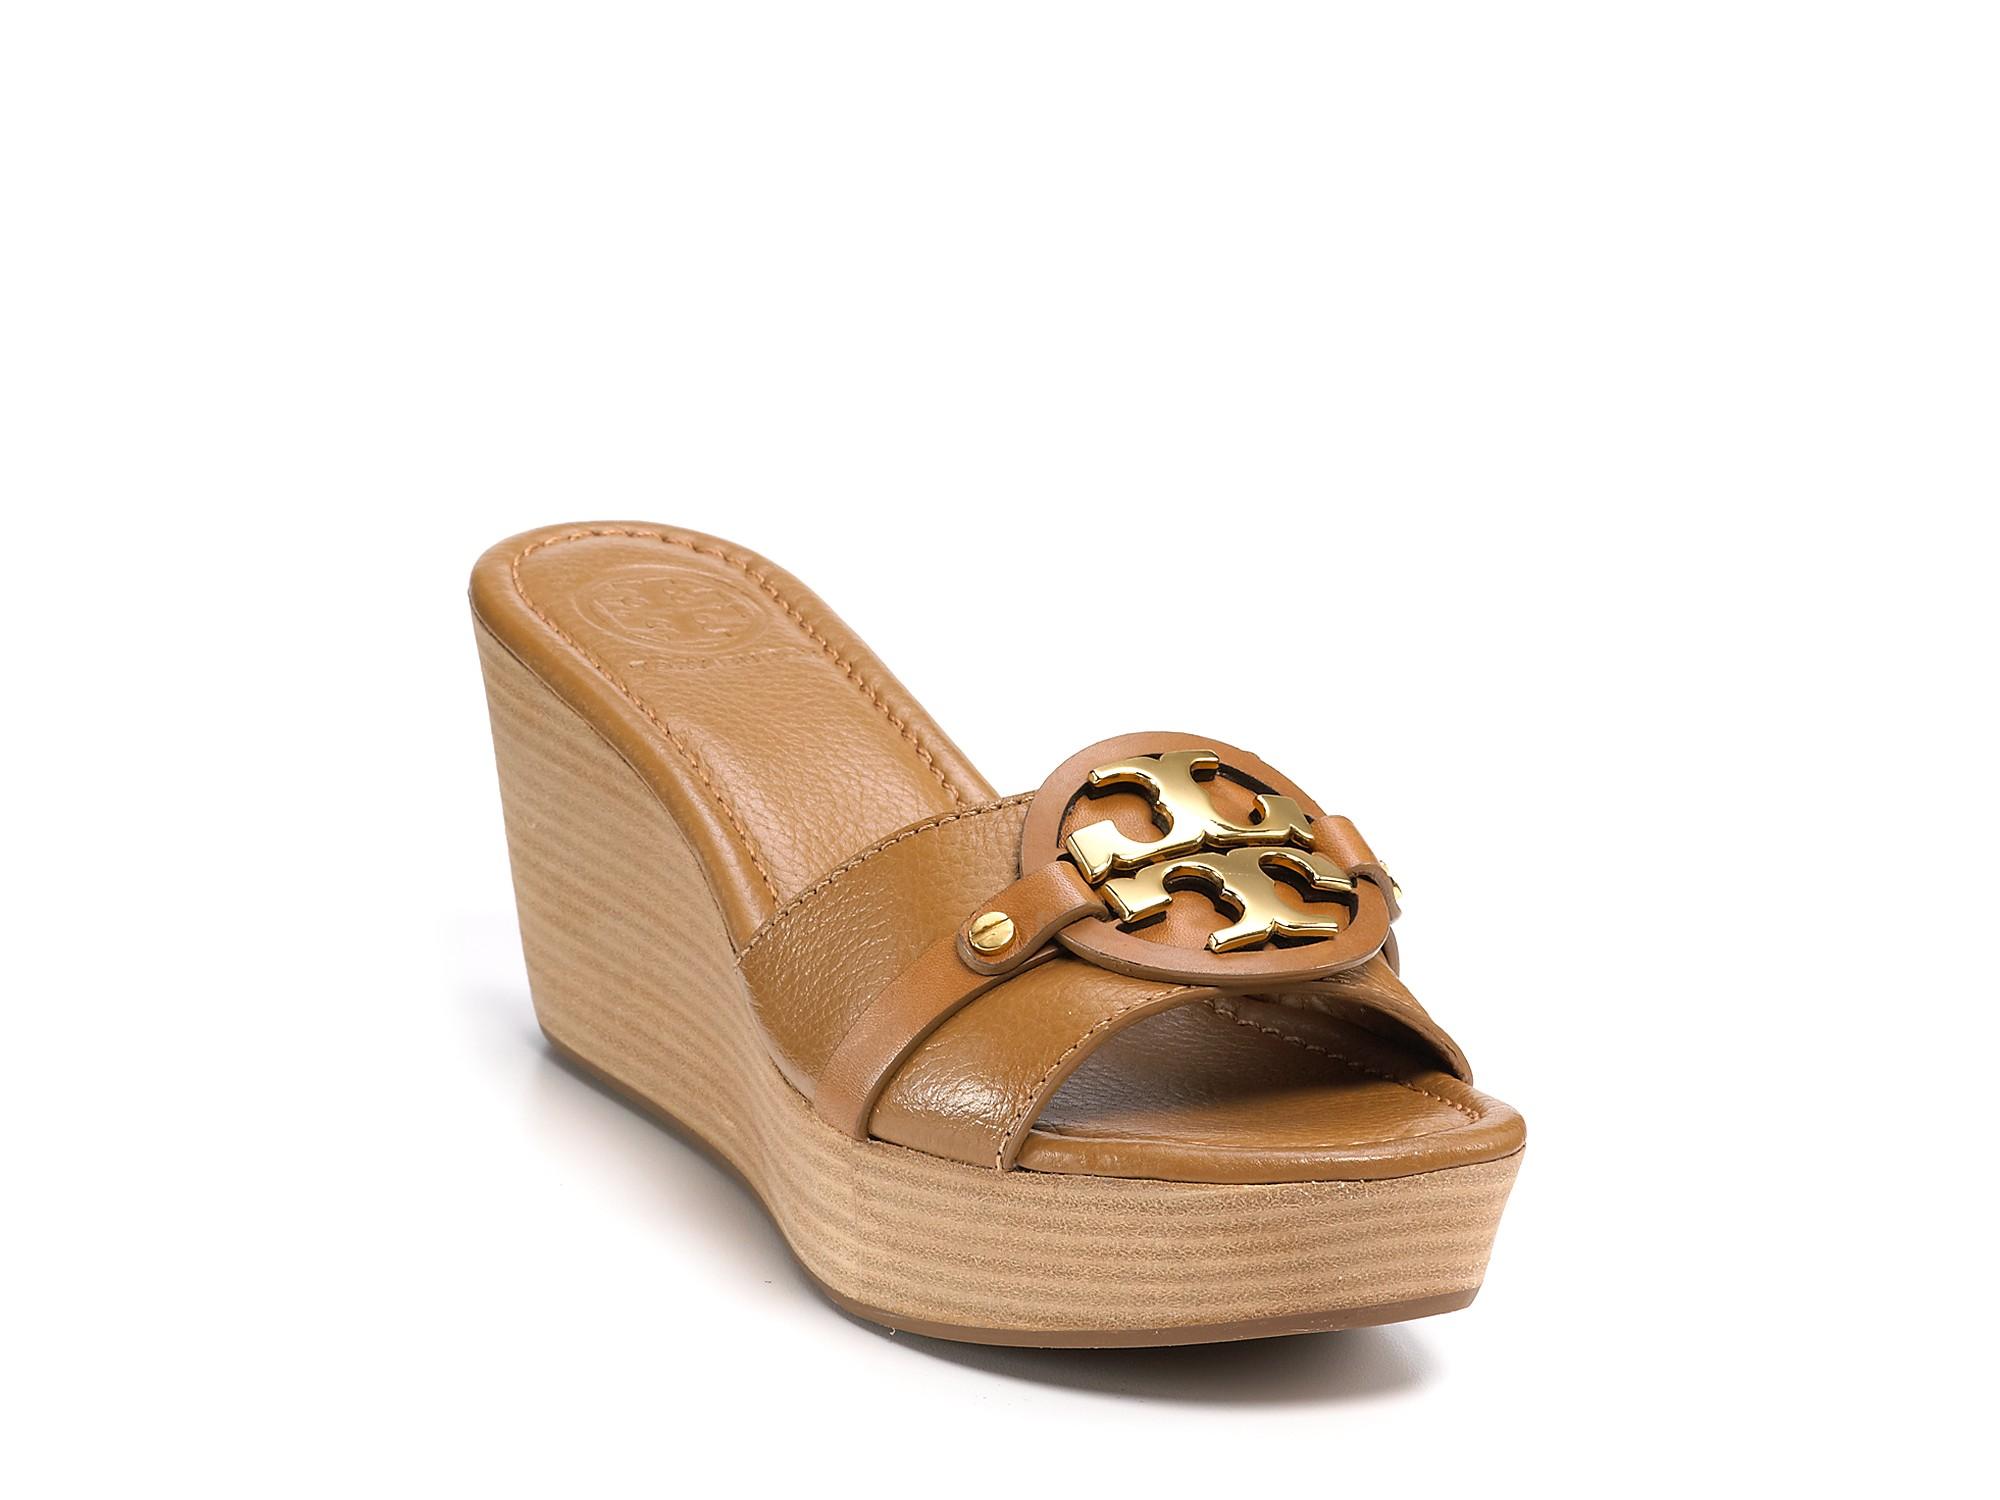 c9ab4c9a86ead Lyst - Tory Burch Patti 3 Wedge Sandals in Brown